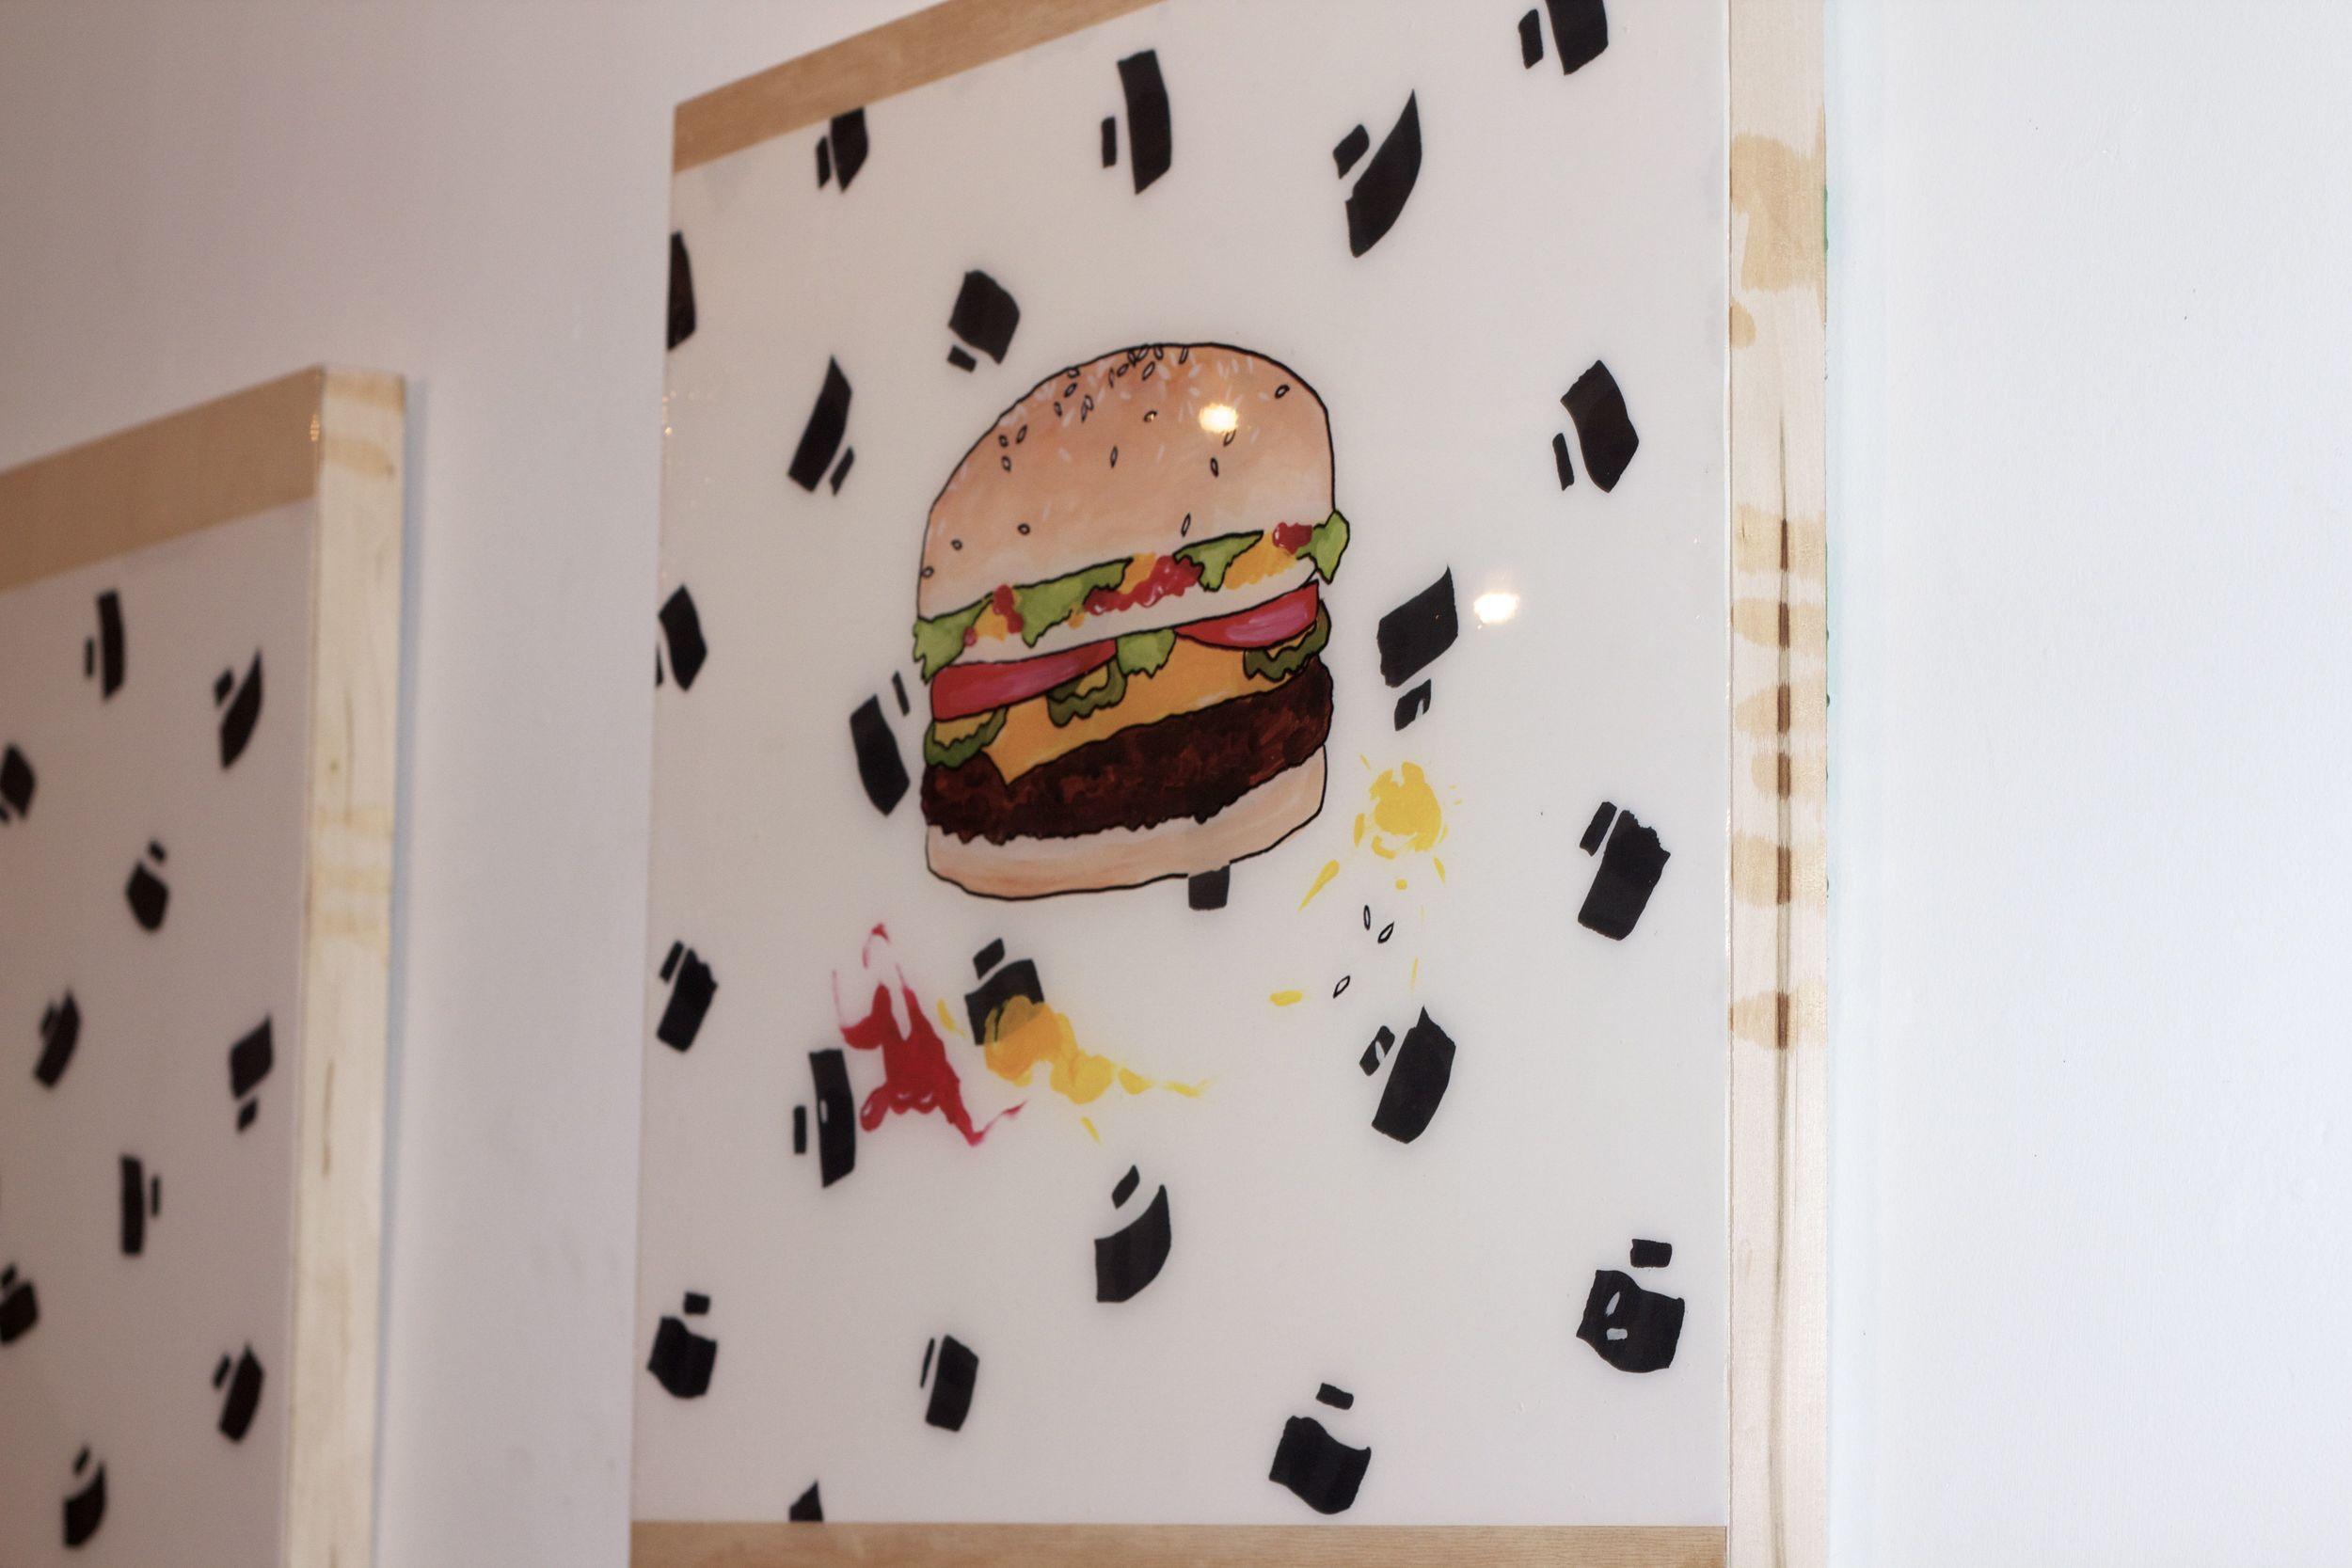 burgers and buns